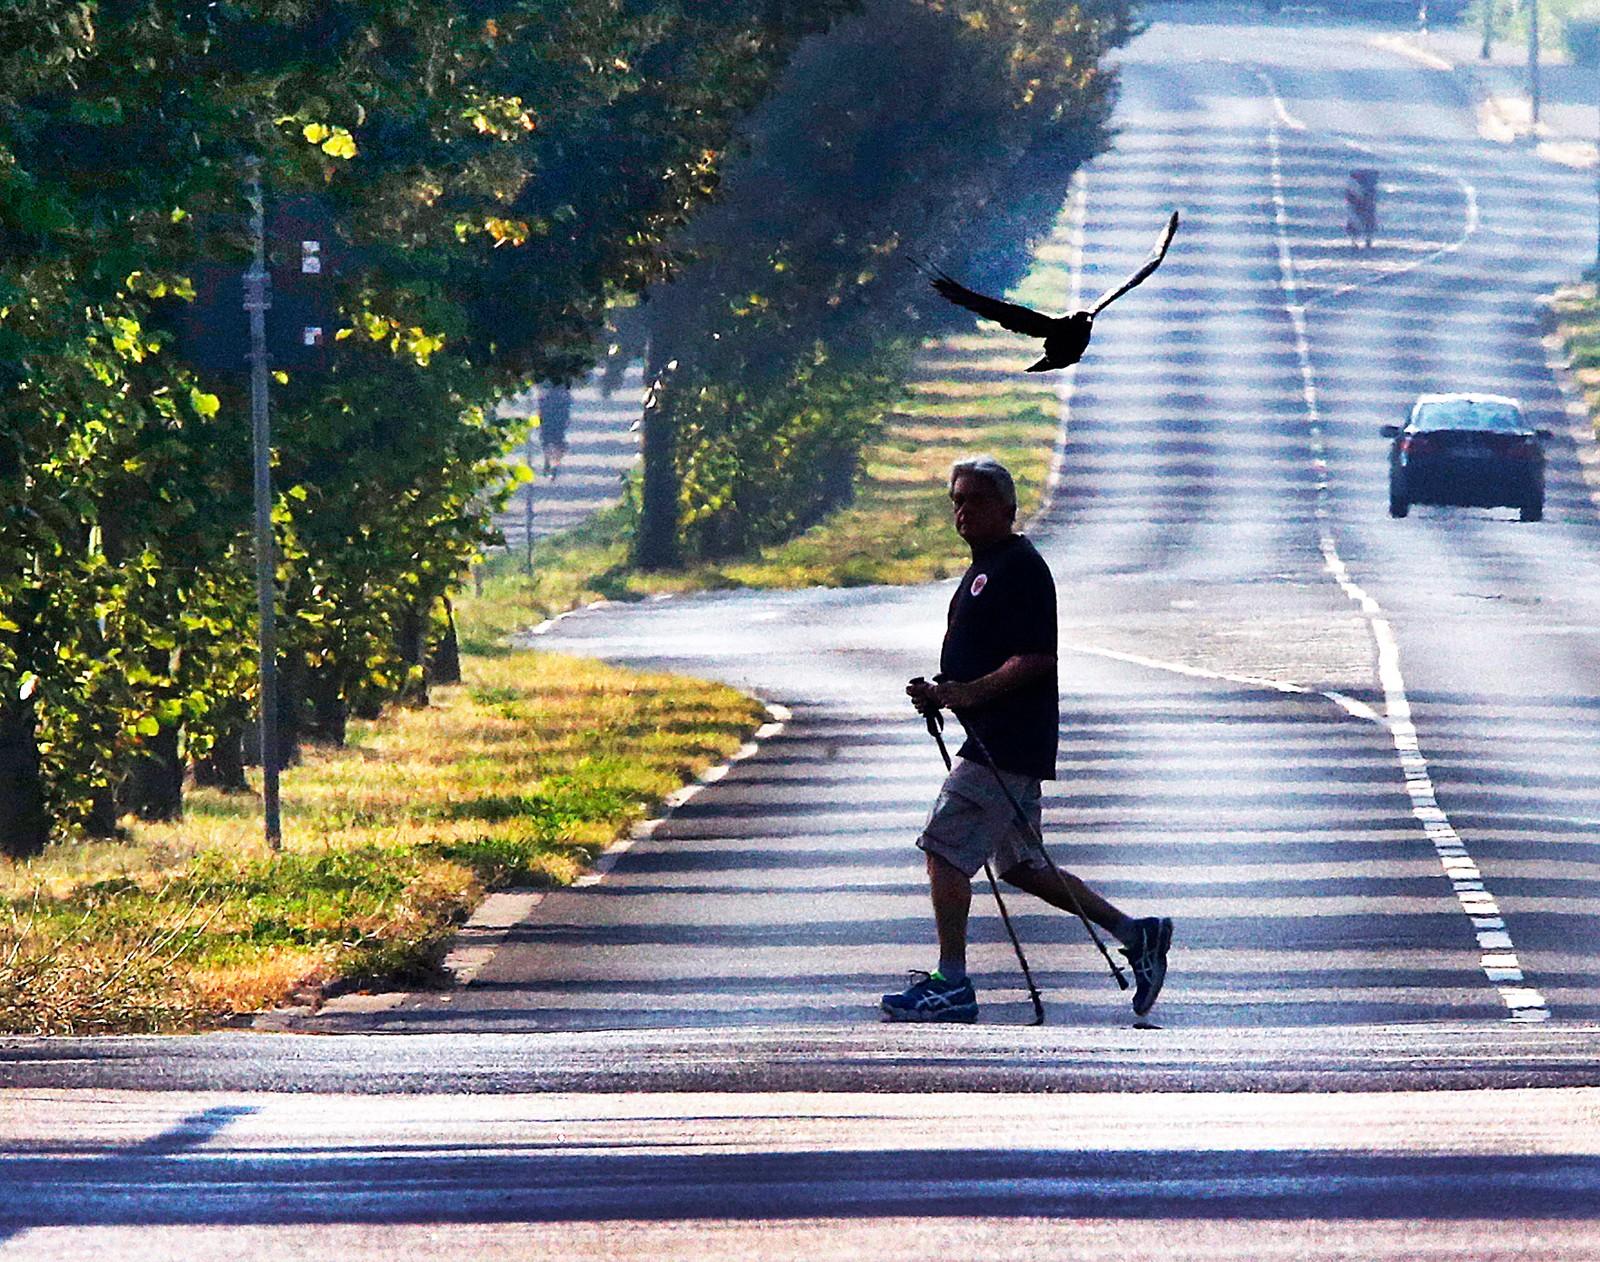 Hverdagsliv. Gående mann og flyvende fugl i Frankfurt i Tyskland den 2. september.